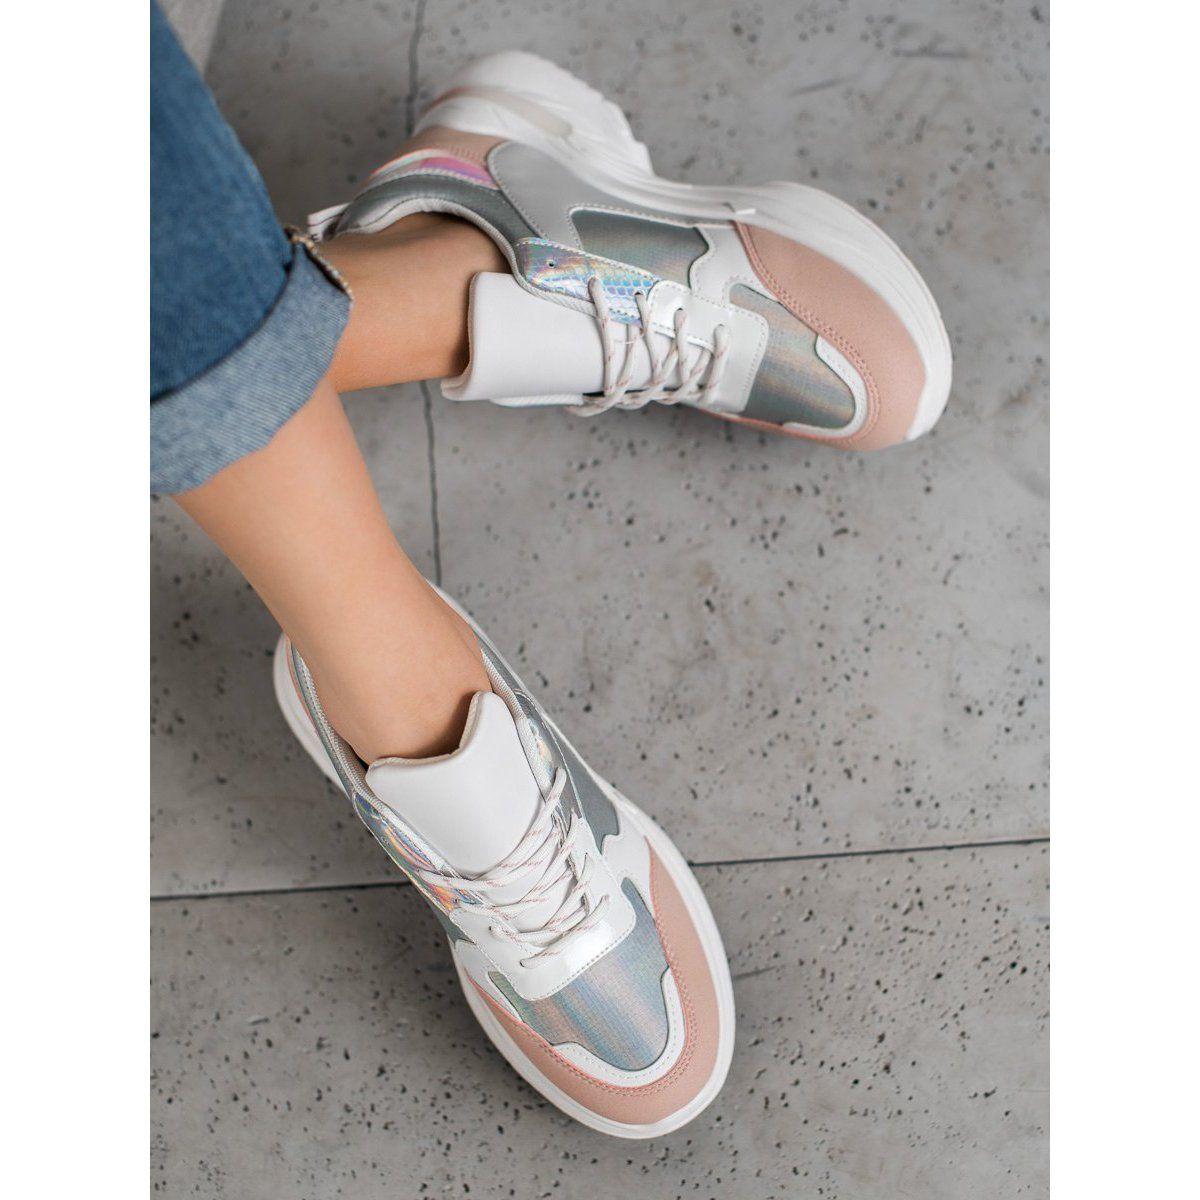 Shelovet Wygodne Sneakersy Na Platformie Biale Wielokolorowe Sneakers Nike Nike Cortez Sneaker Sneakers